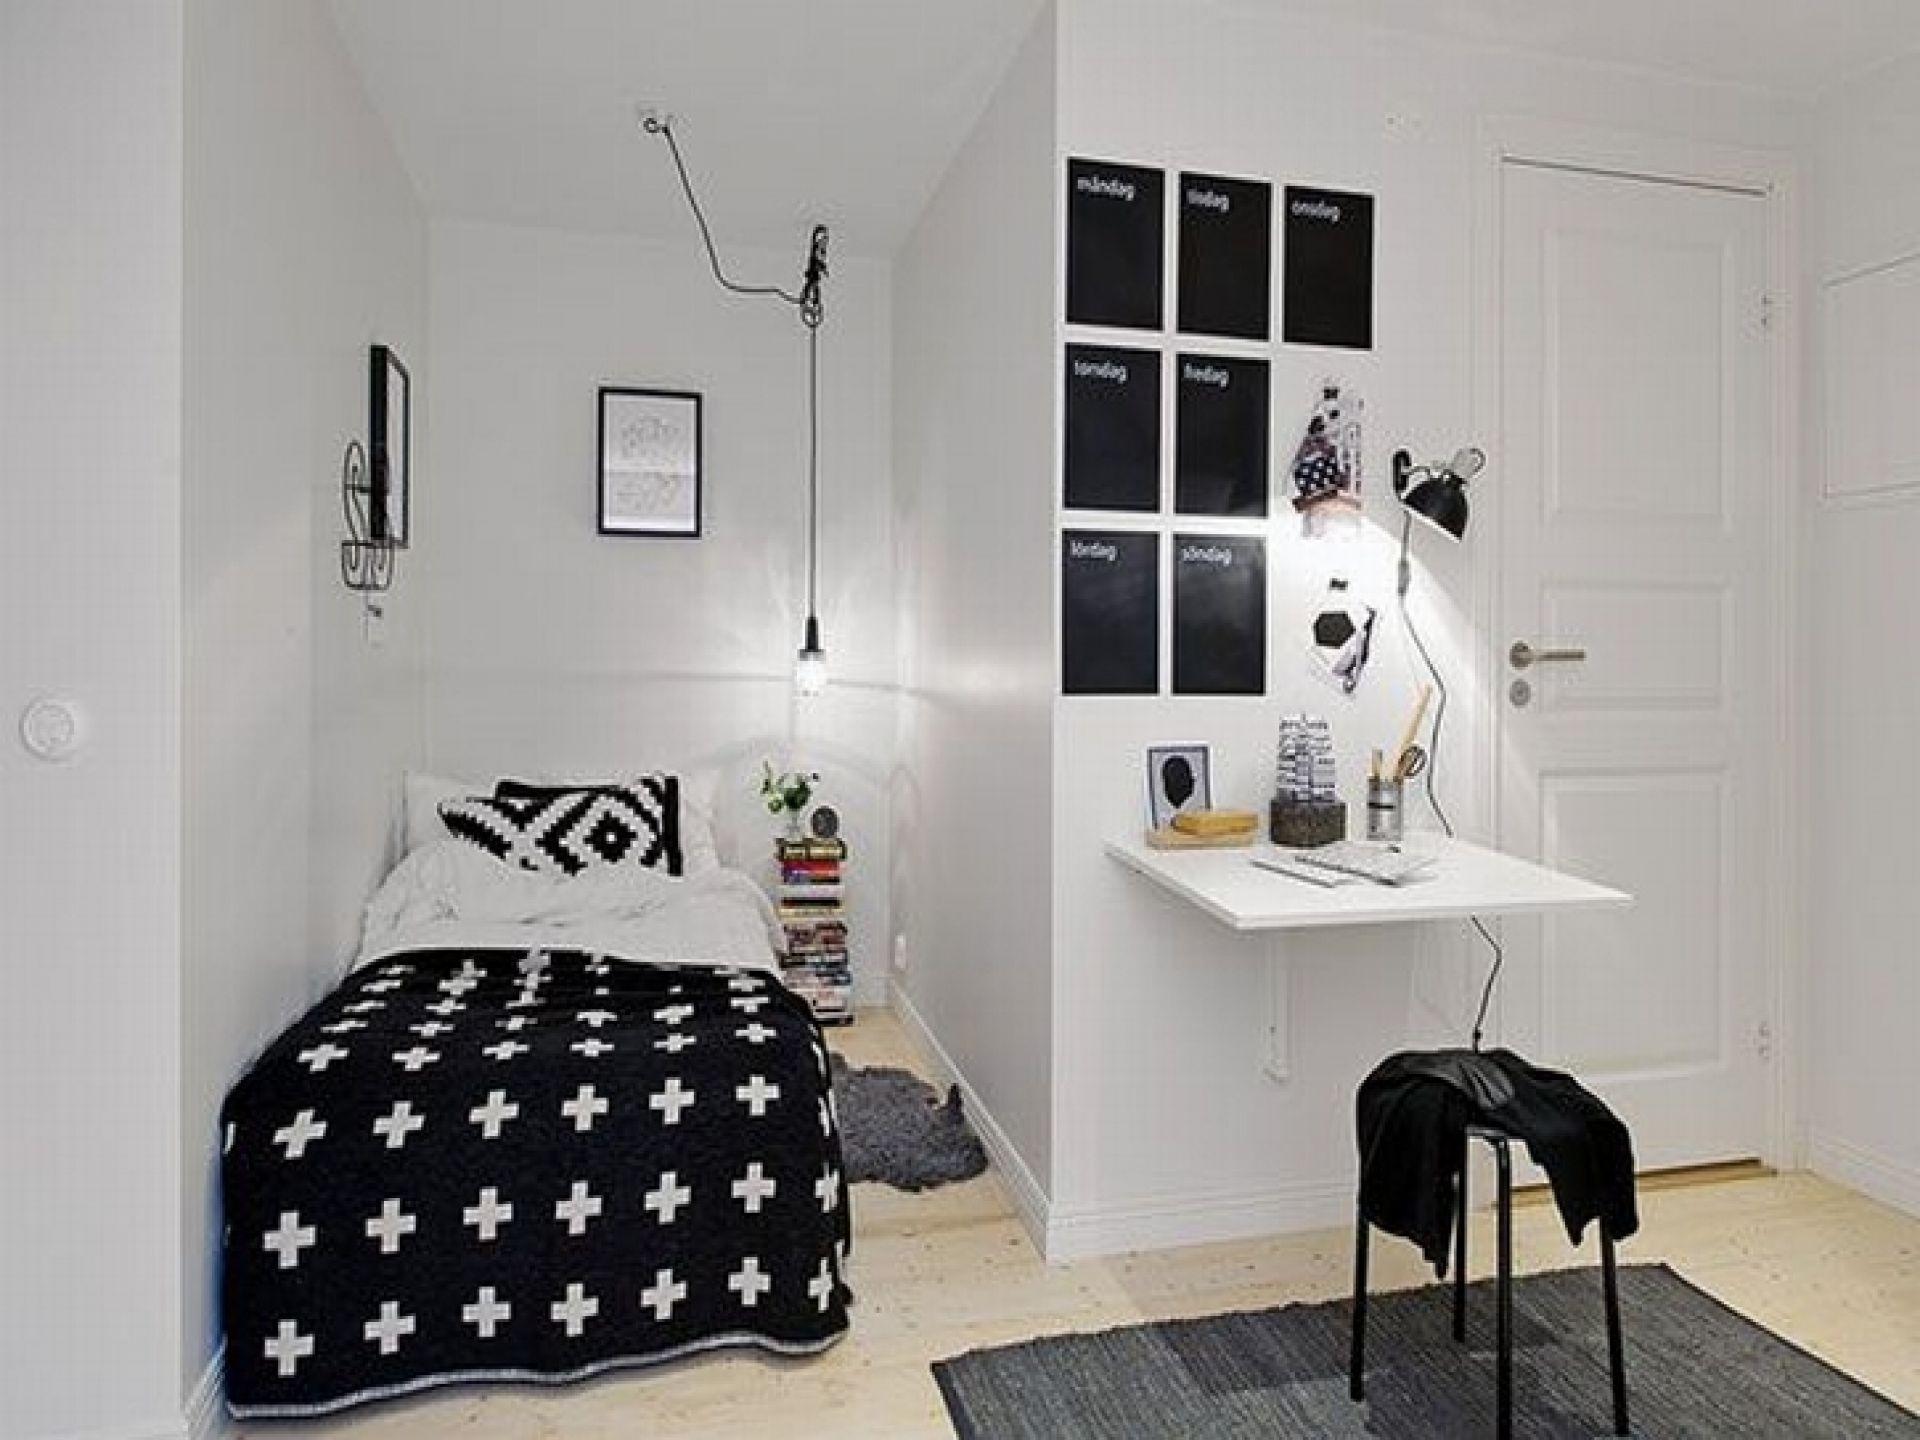 See more ideas about lakberendezés, otthon, lakás. Single Bedroom Design Ideas For Girls – TRENDECORS